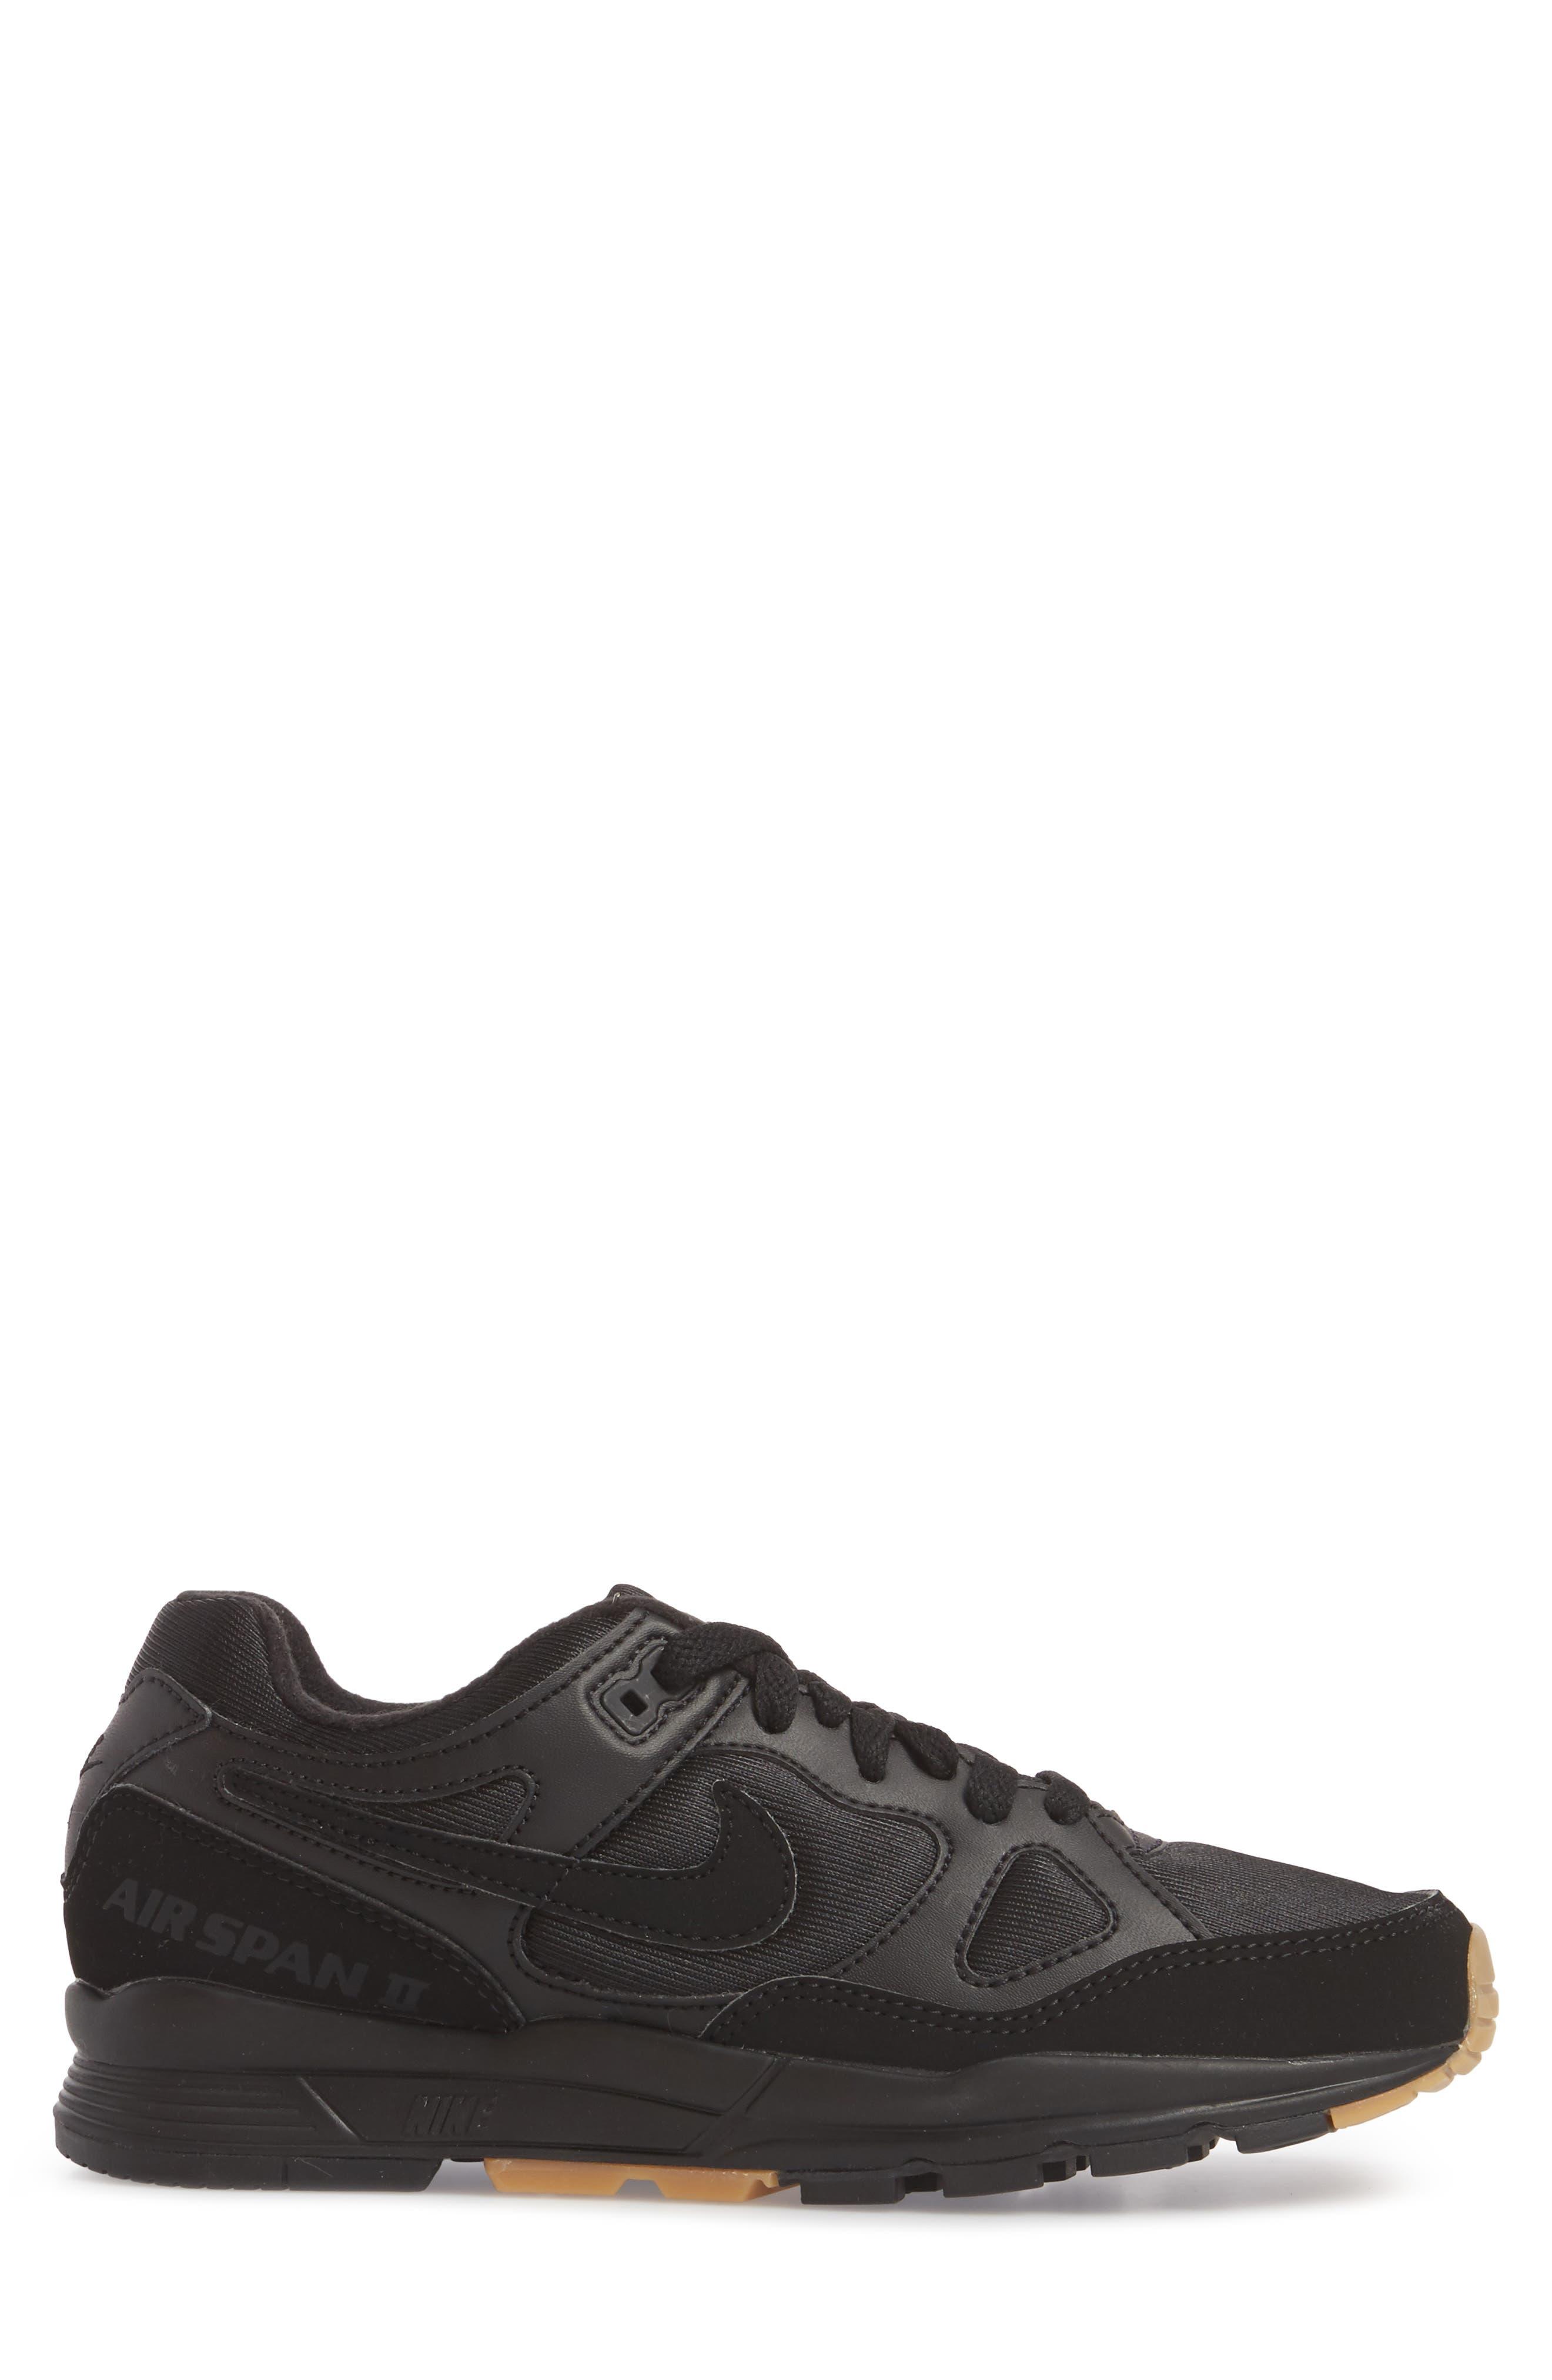 Air Span II Sneaker,                             Alternate thumbnail 3, color,                             BLACK/ BLACK/ BLACK